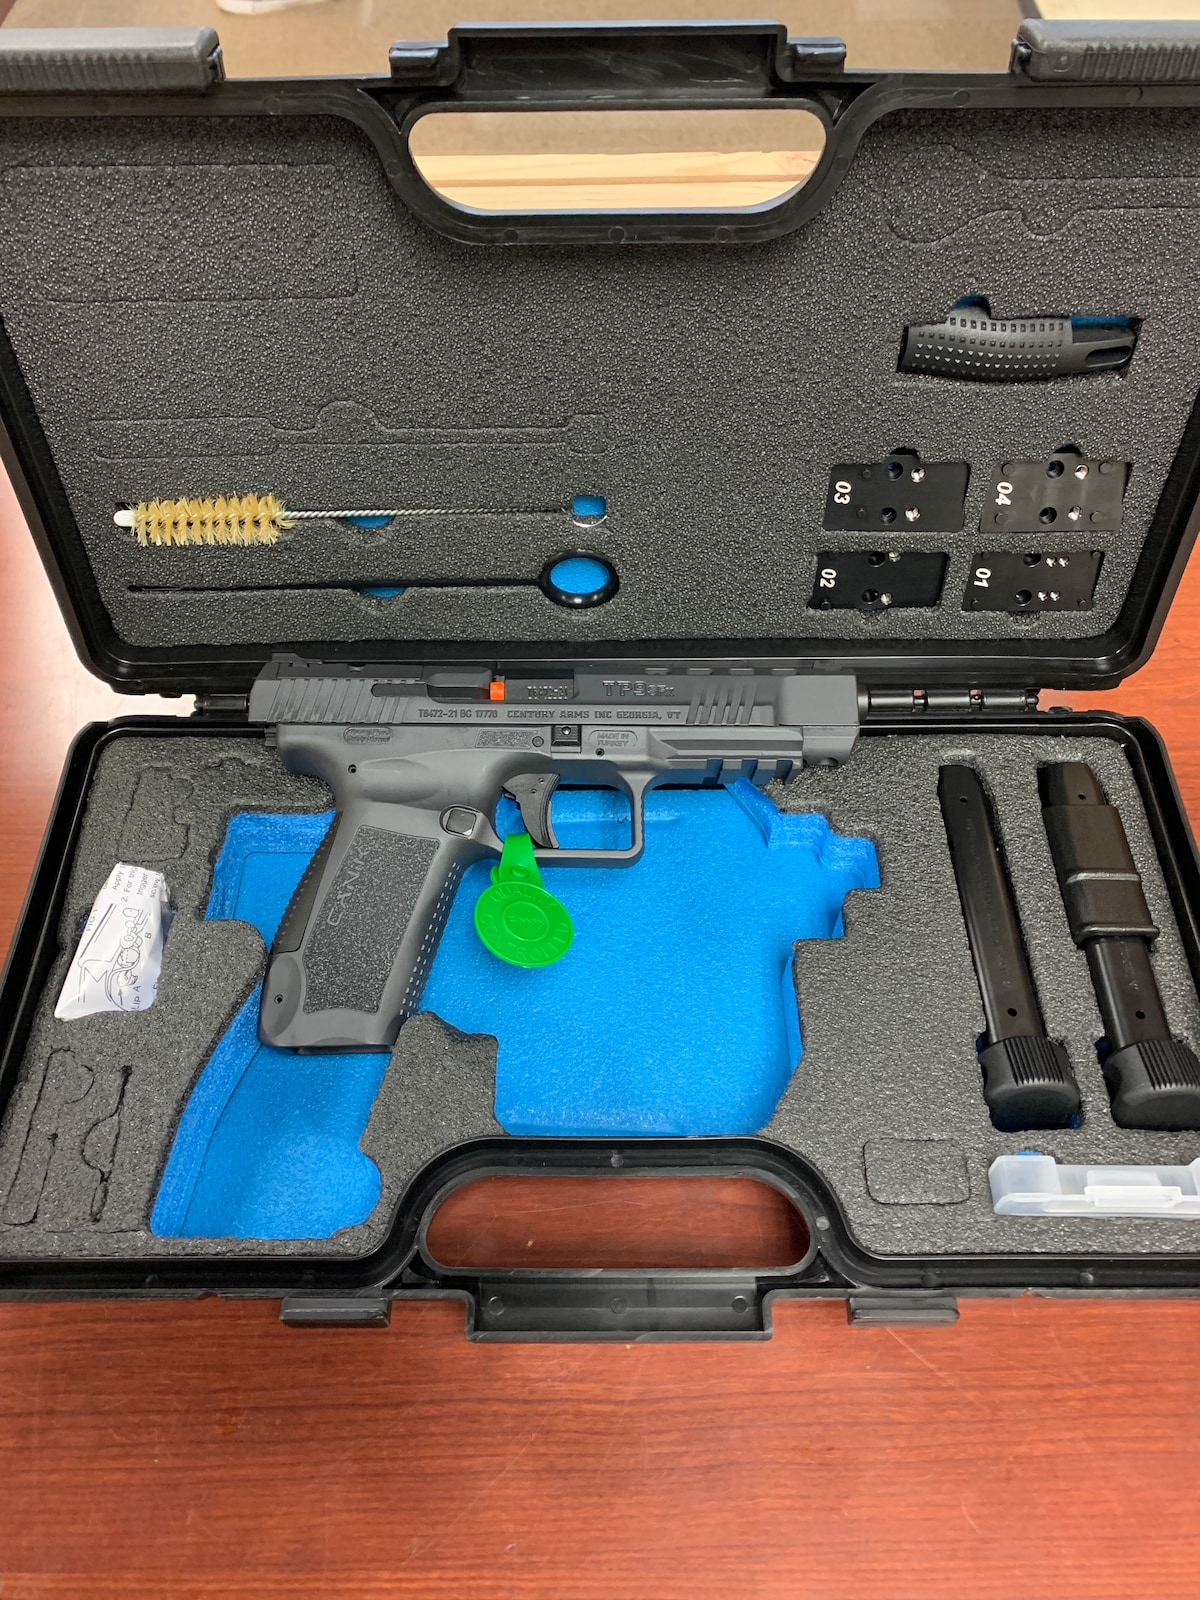 CANIK tp9sf optics ready sniper grey hg3774sg-n